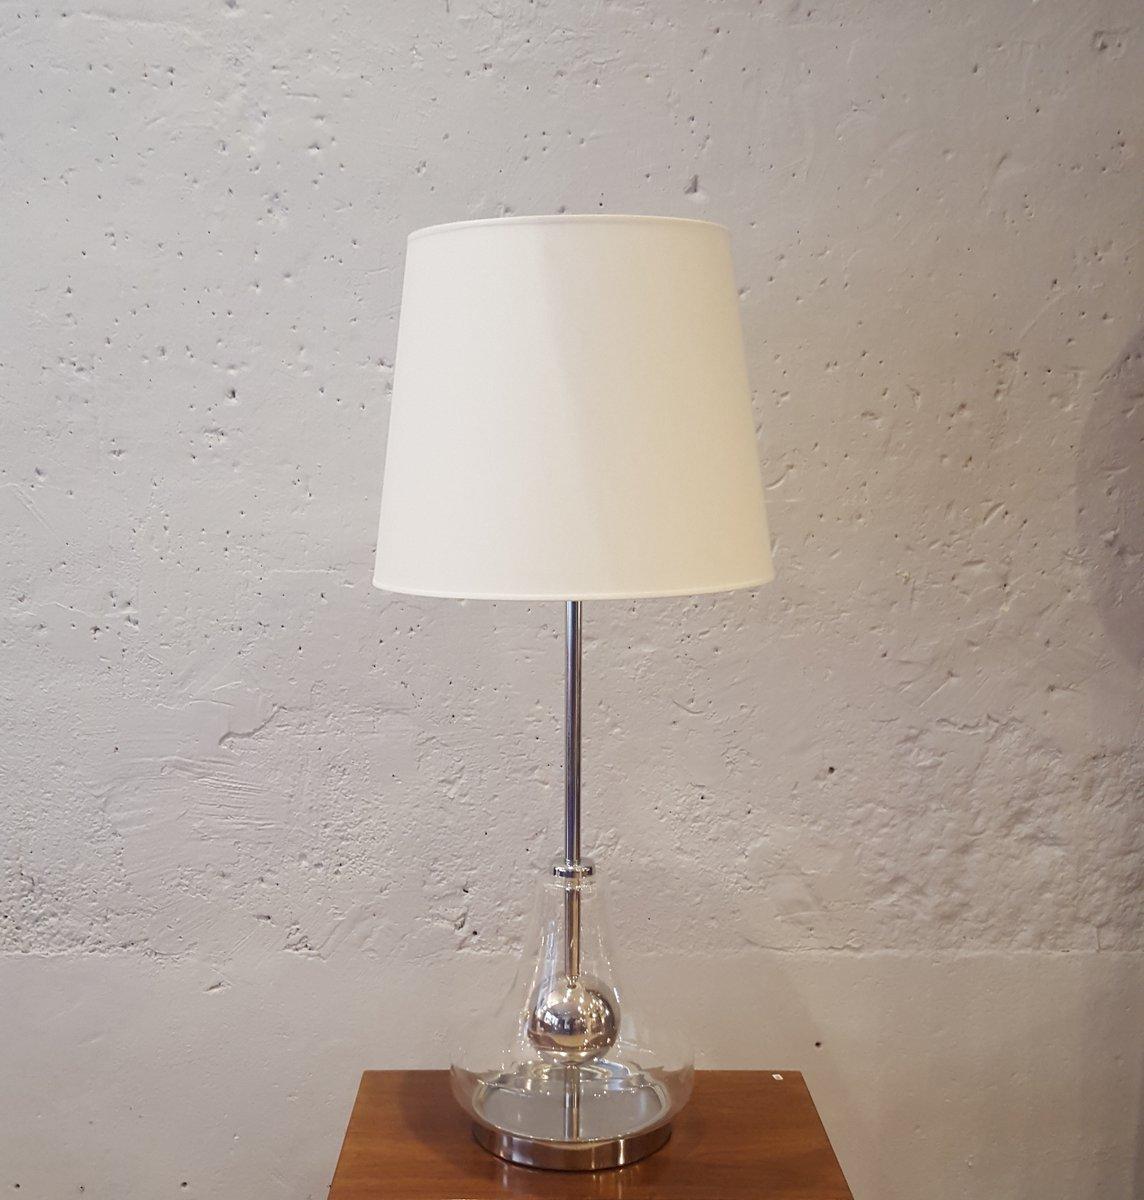 gro e lampe aus glas verchromten metall 1970er bei pamono kaufen. Black Bedroom Furniture Sets. Home Design Ideas